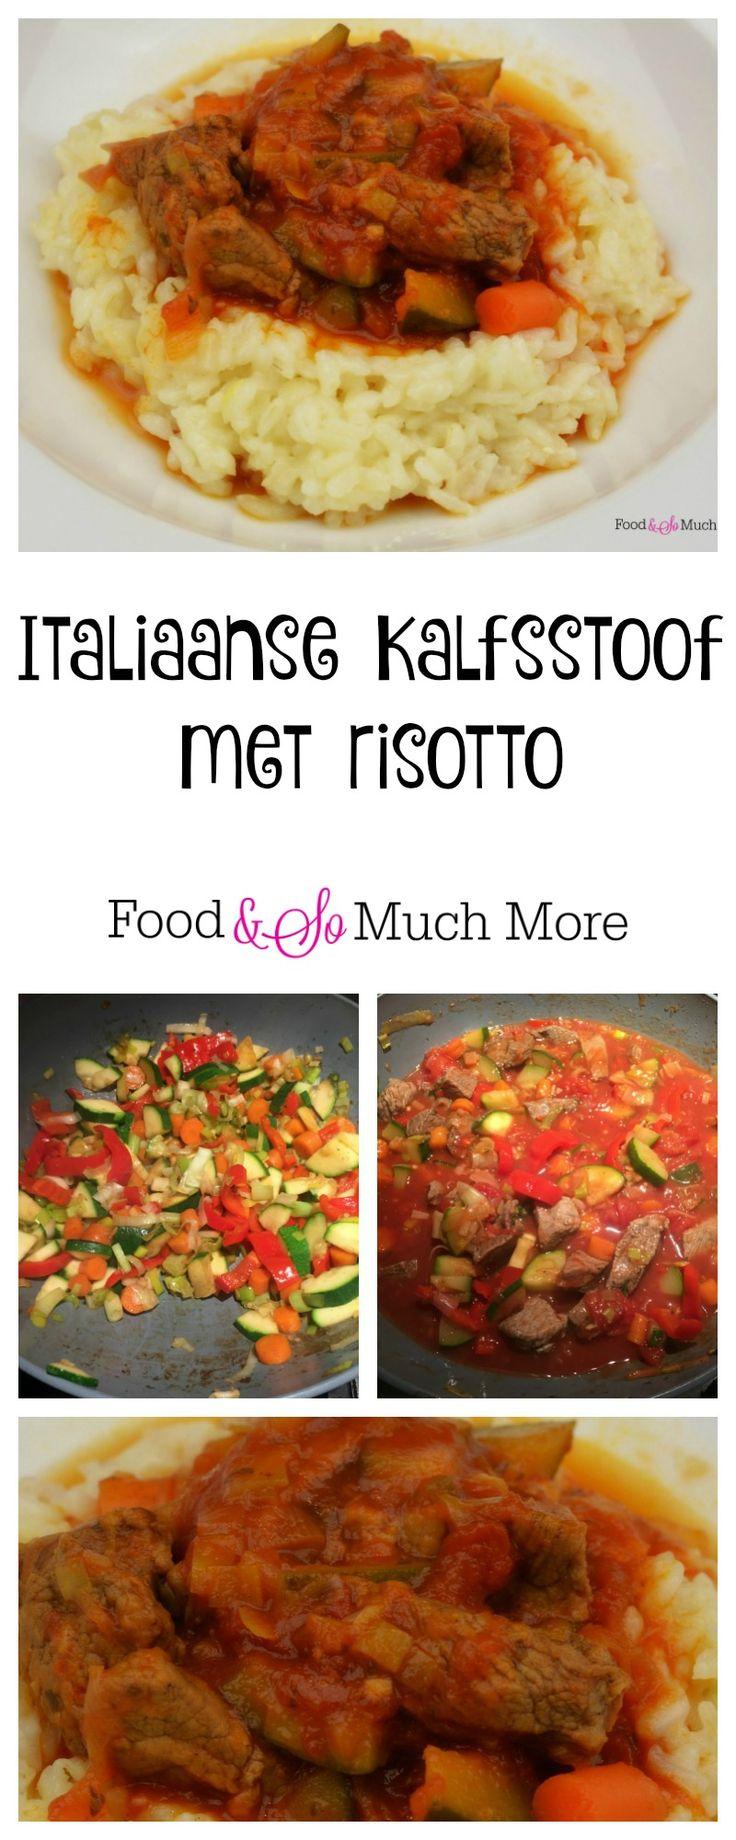 Italiaanse kalfsstoof met risotto. Recept van foodensomuchmore.nl